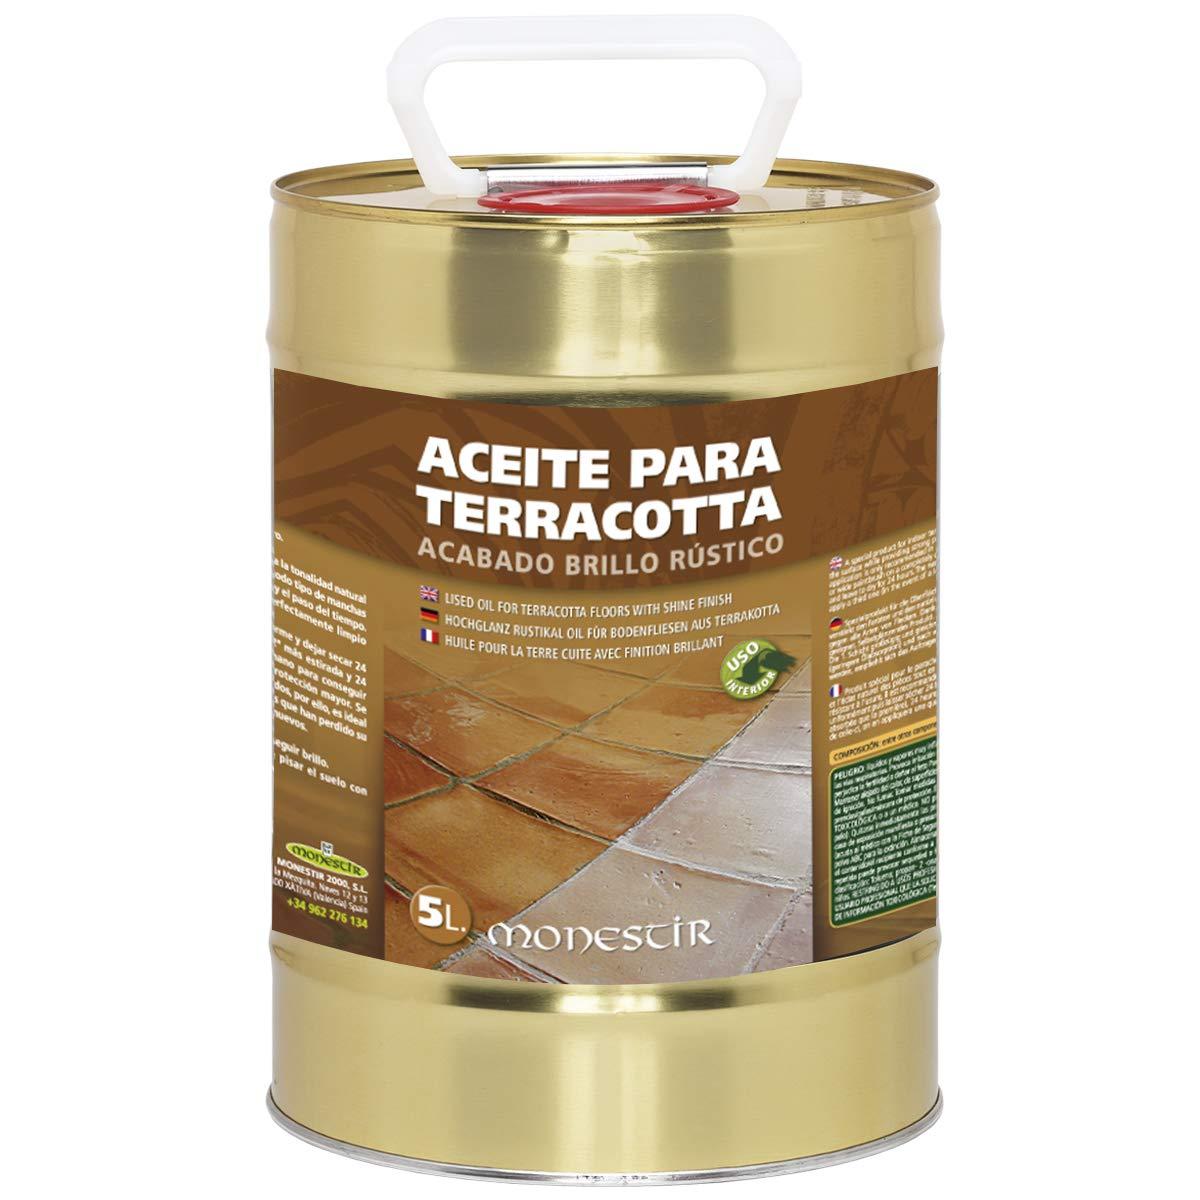 Aceite para suelos Terracotta o Barro. Acabado brillo rú stico. Monestir (1 L)